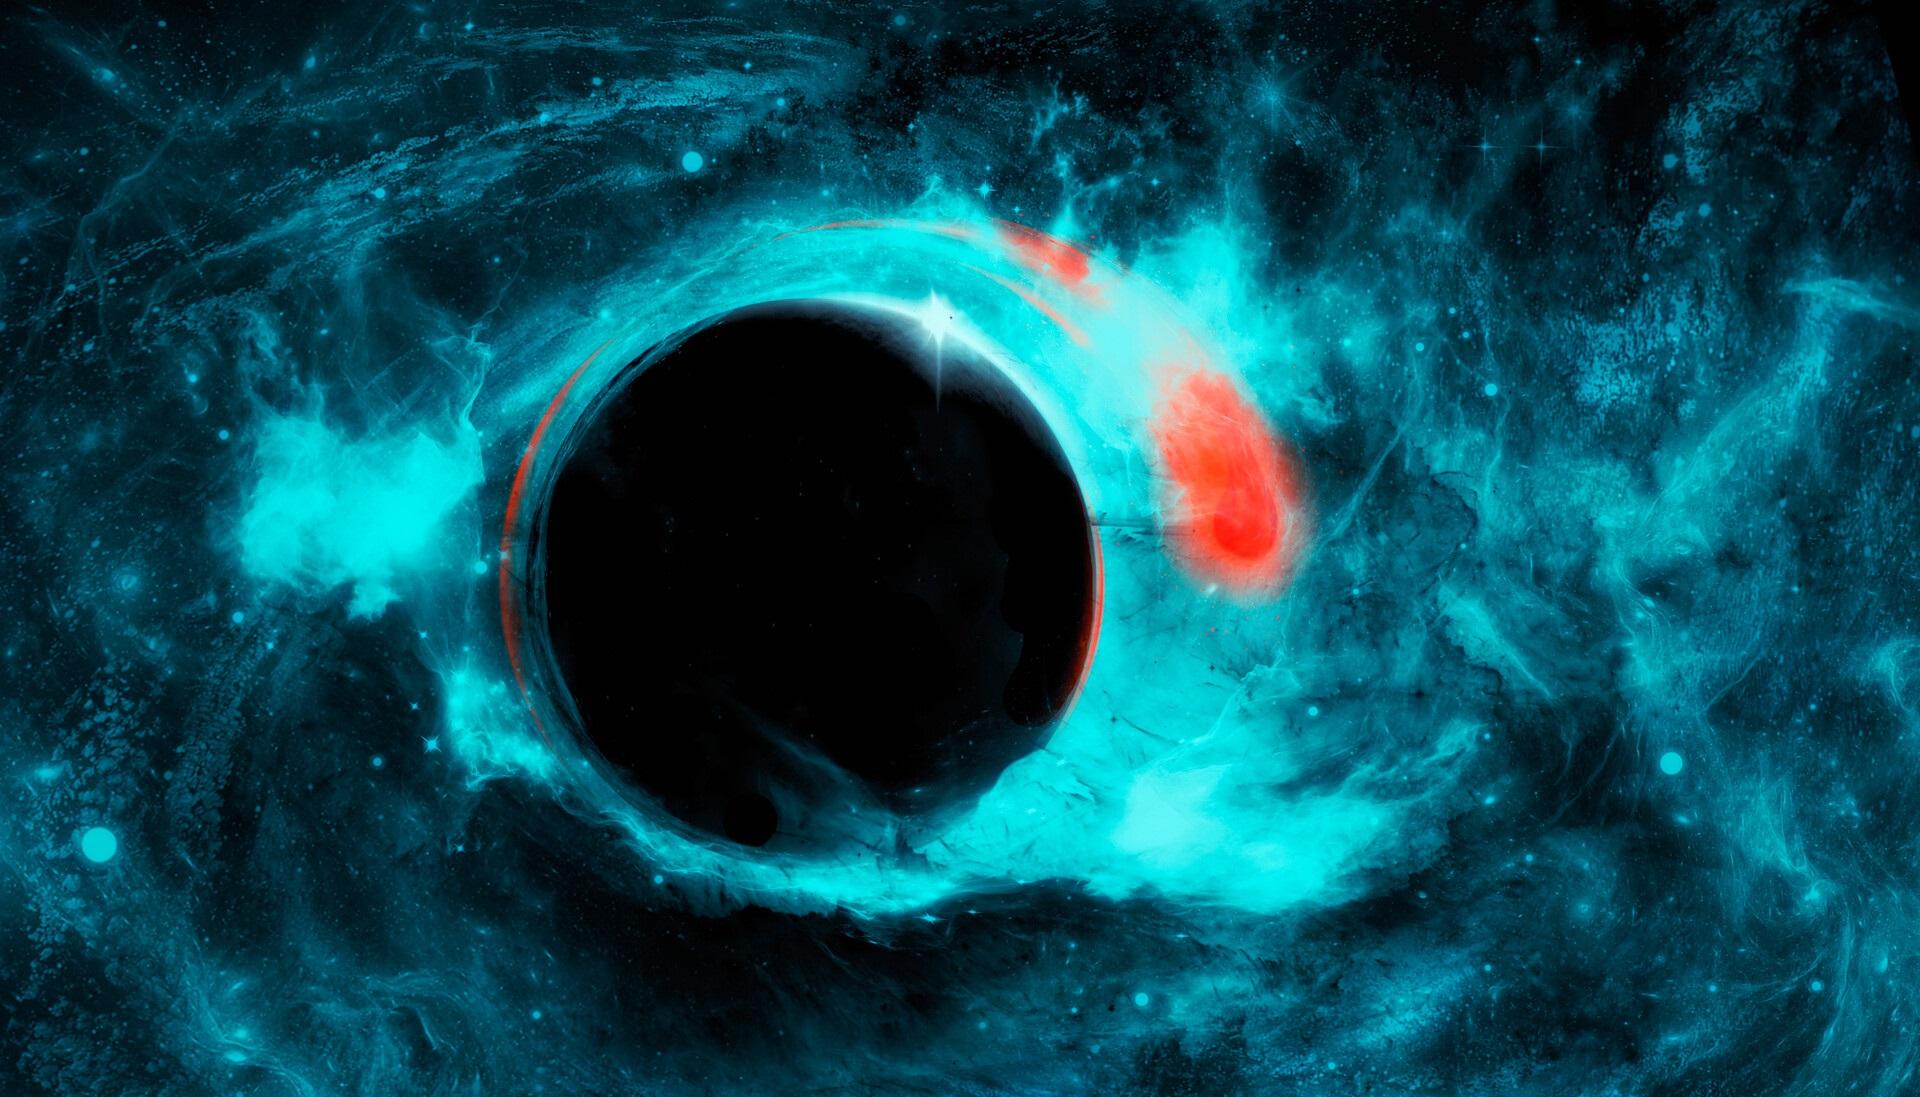 Artwork Fantasy Art Black Holes Space 1920x1097